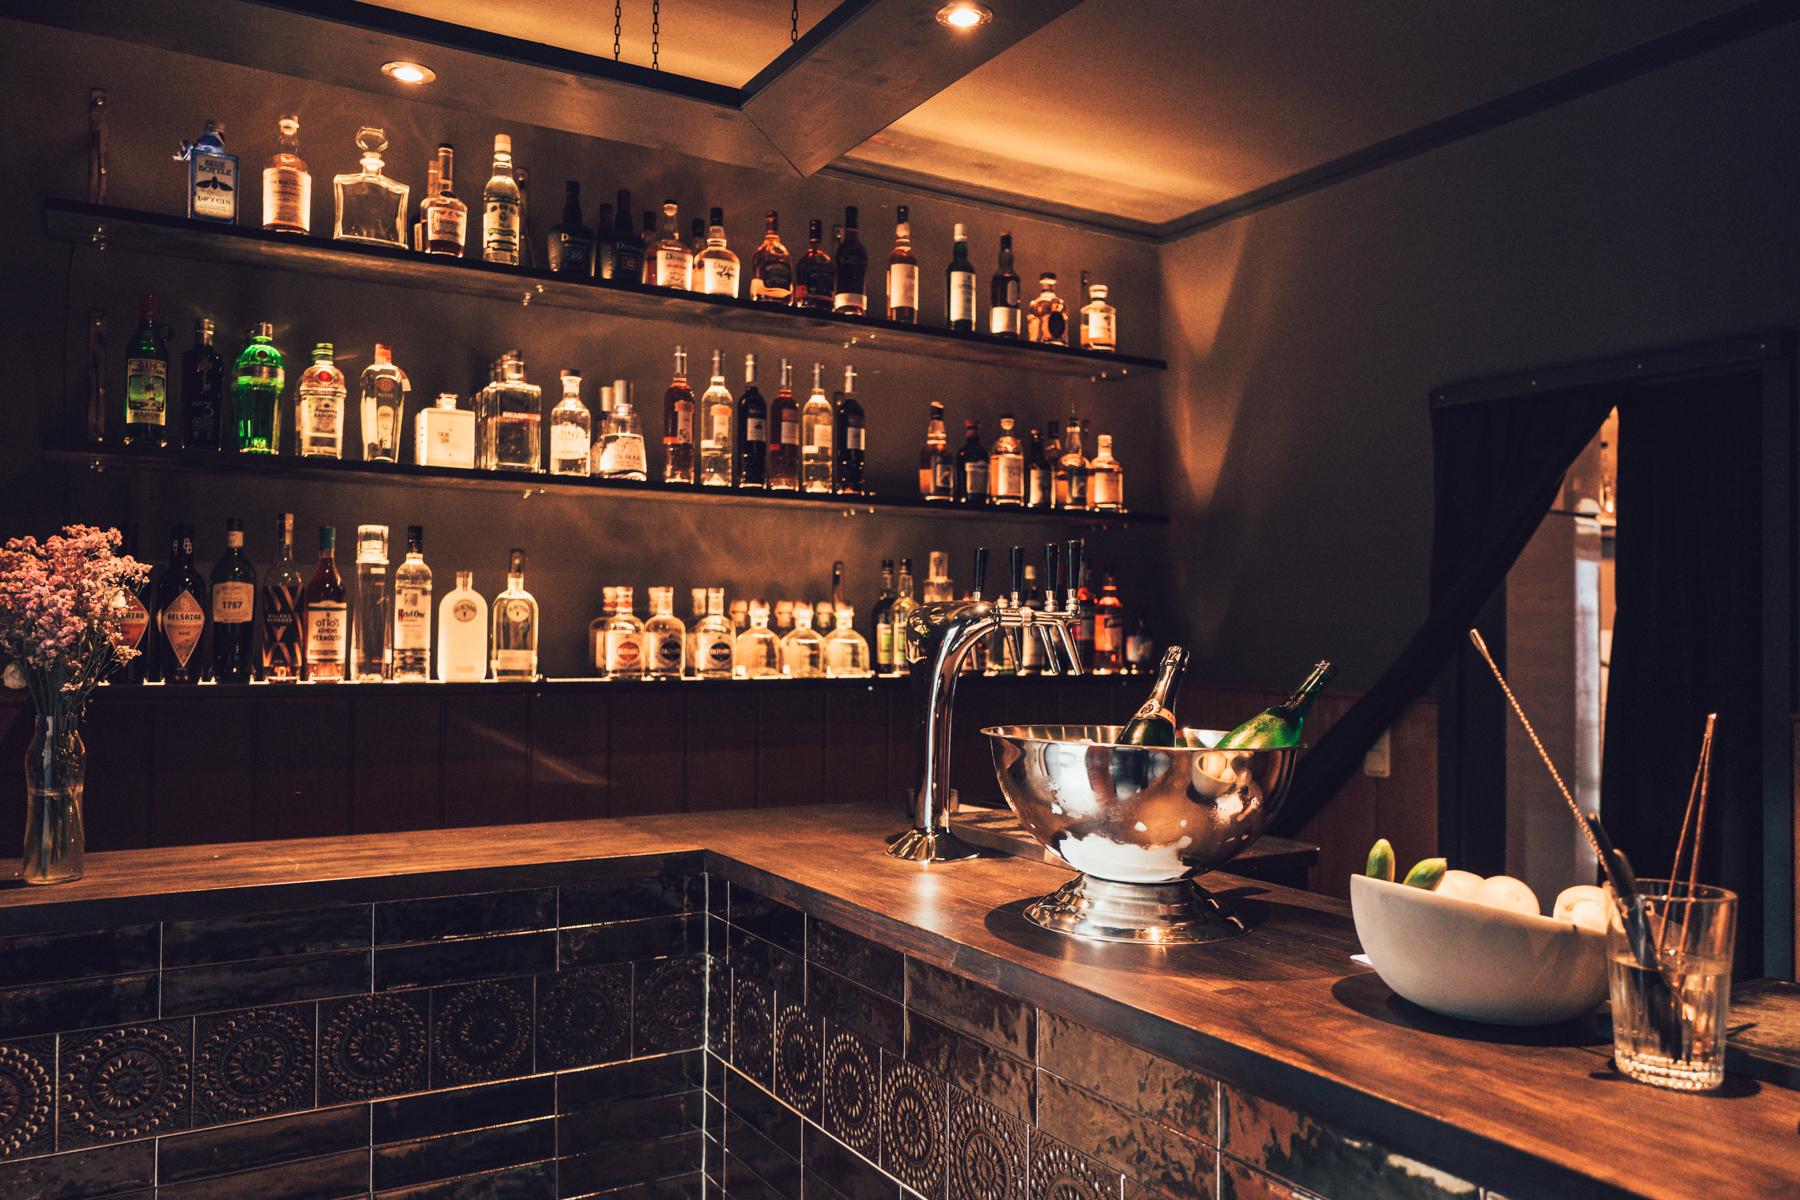 Geheimtipp Hamburg Altona Bar Tiny Oyster Inn Cristina Lopez 9